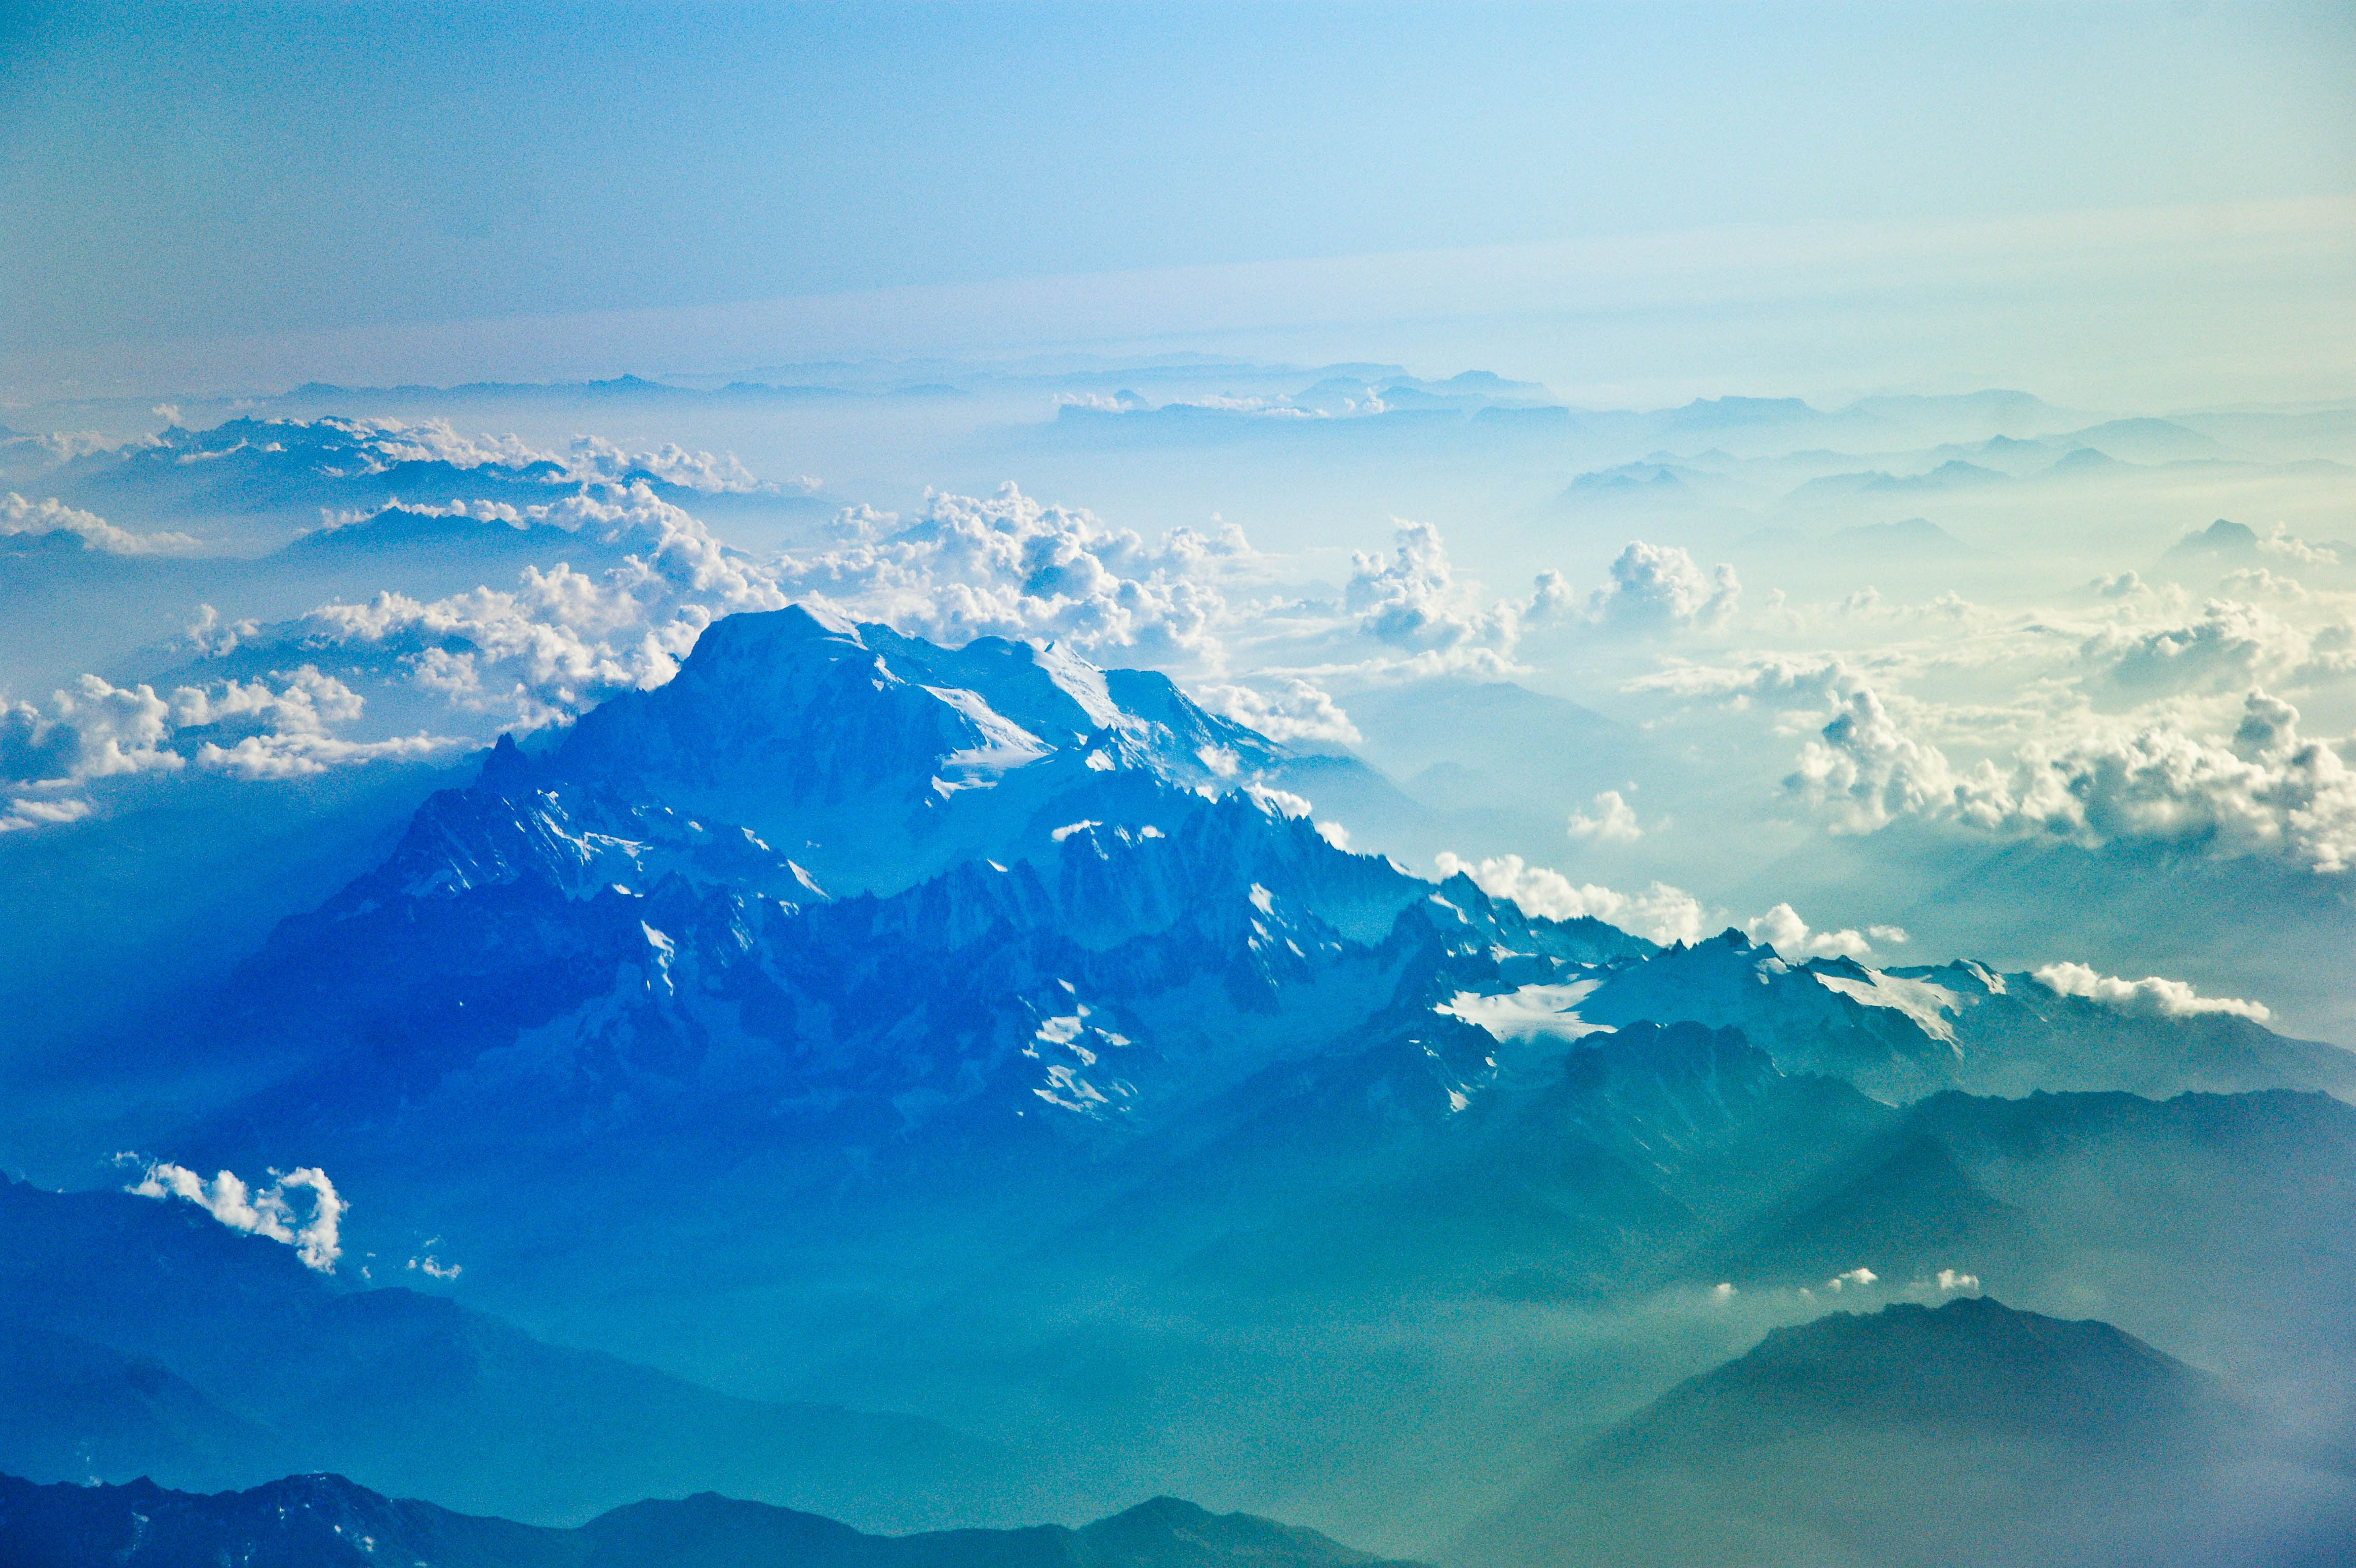 Best Wallpaper Mountain Horizon - e50891fa03520960c5801493b6ac4ef6  Graphic_113318.jpg